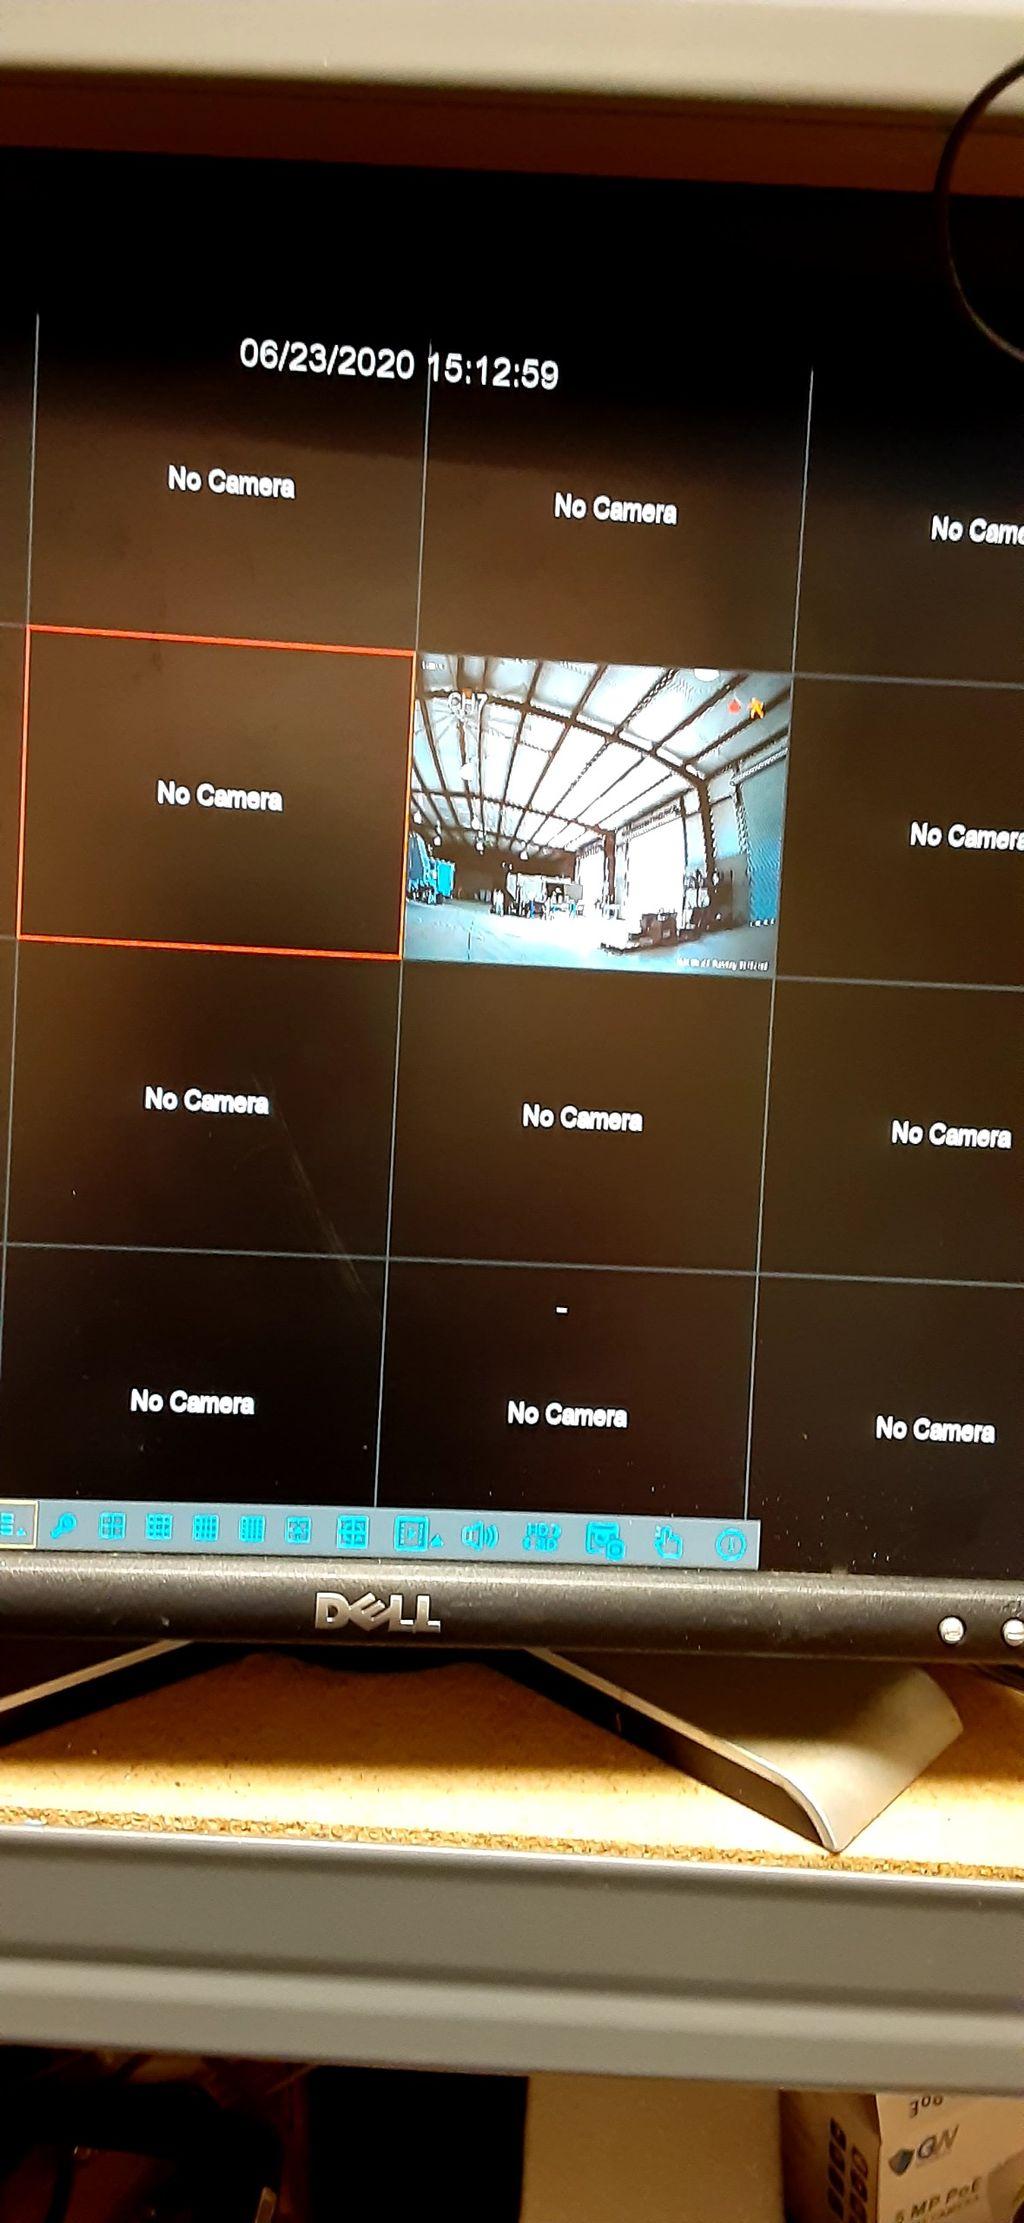 Natural Gas company surveillance system